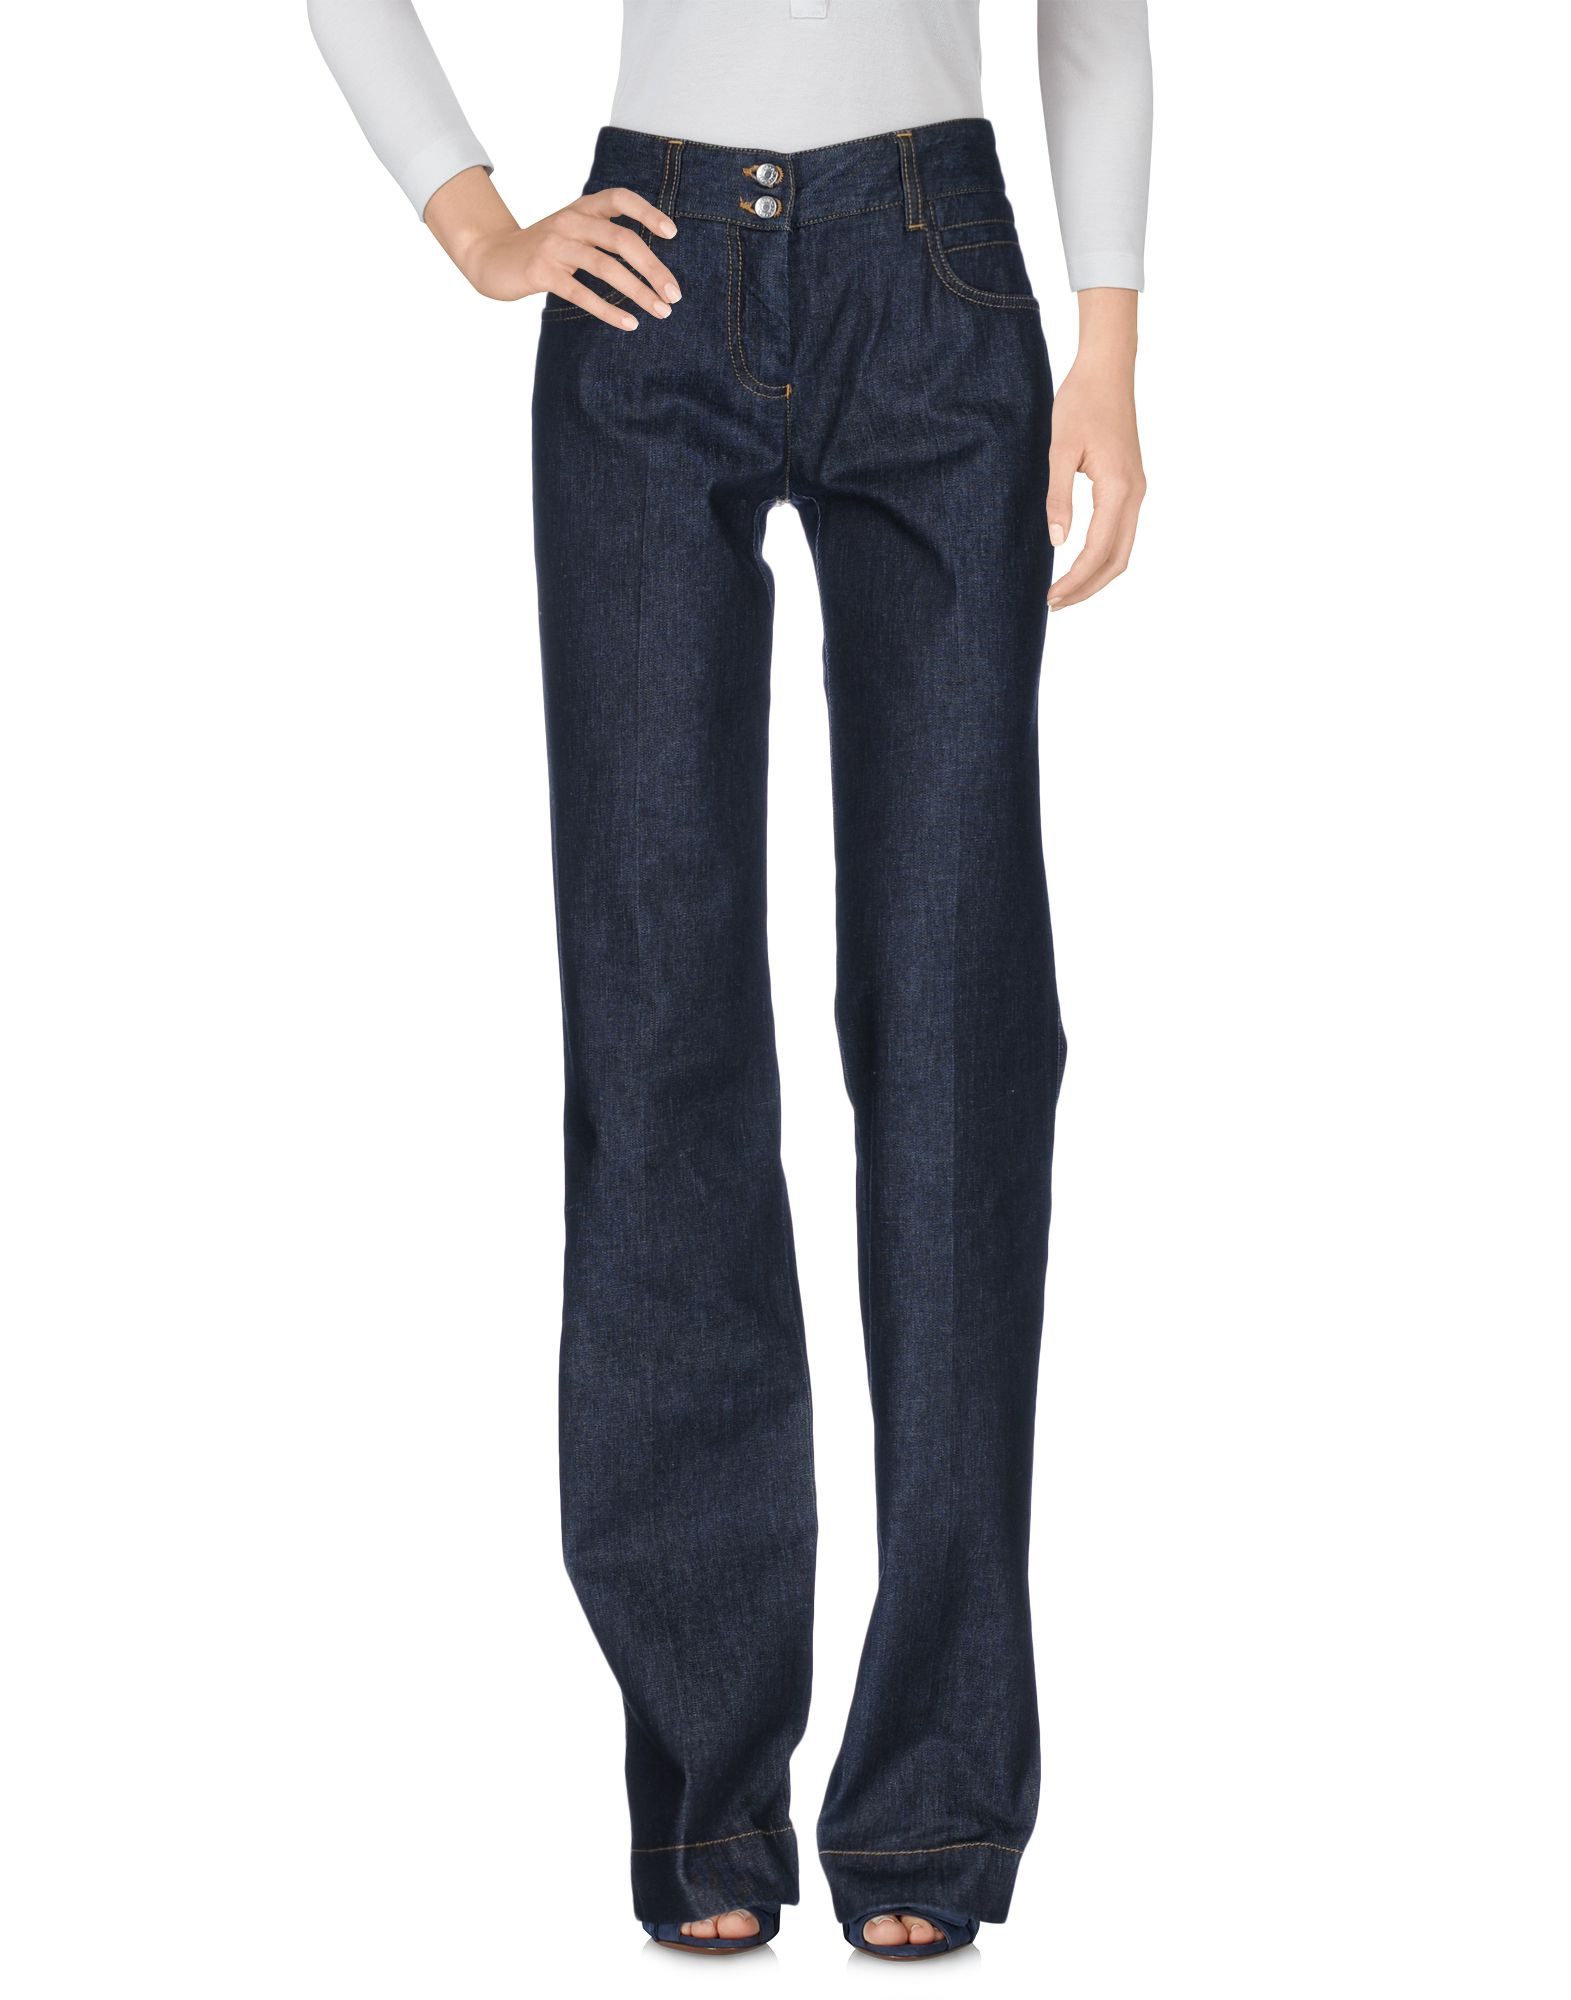 DOLCE & GABBANA Damen Jeanshose Farbe Blau Größe 1 - broschei